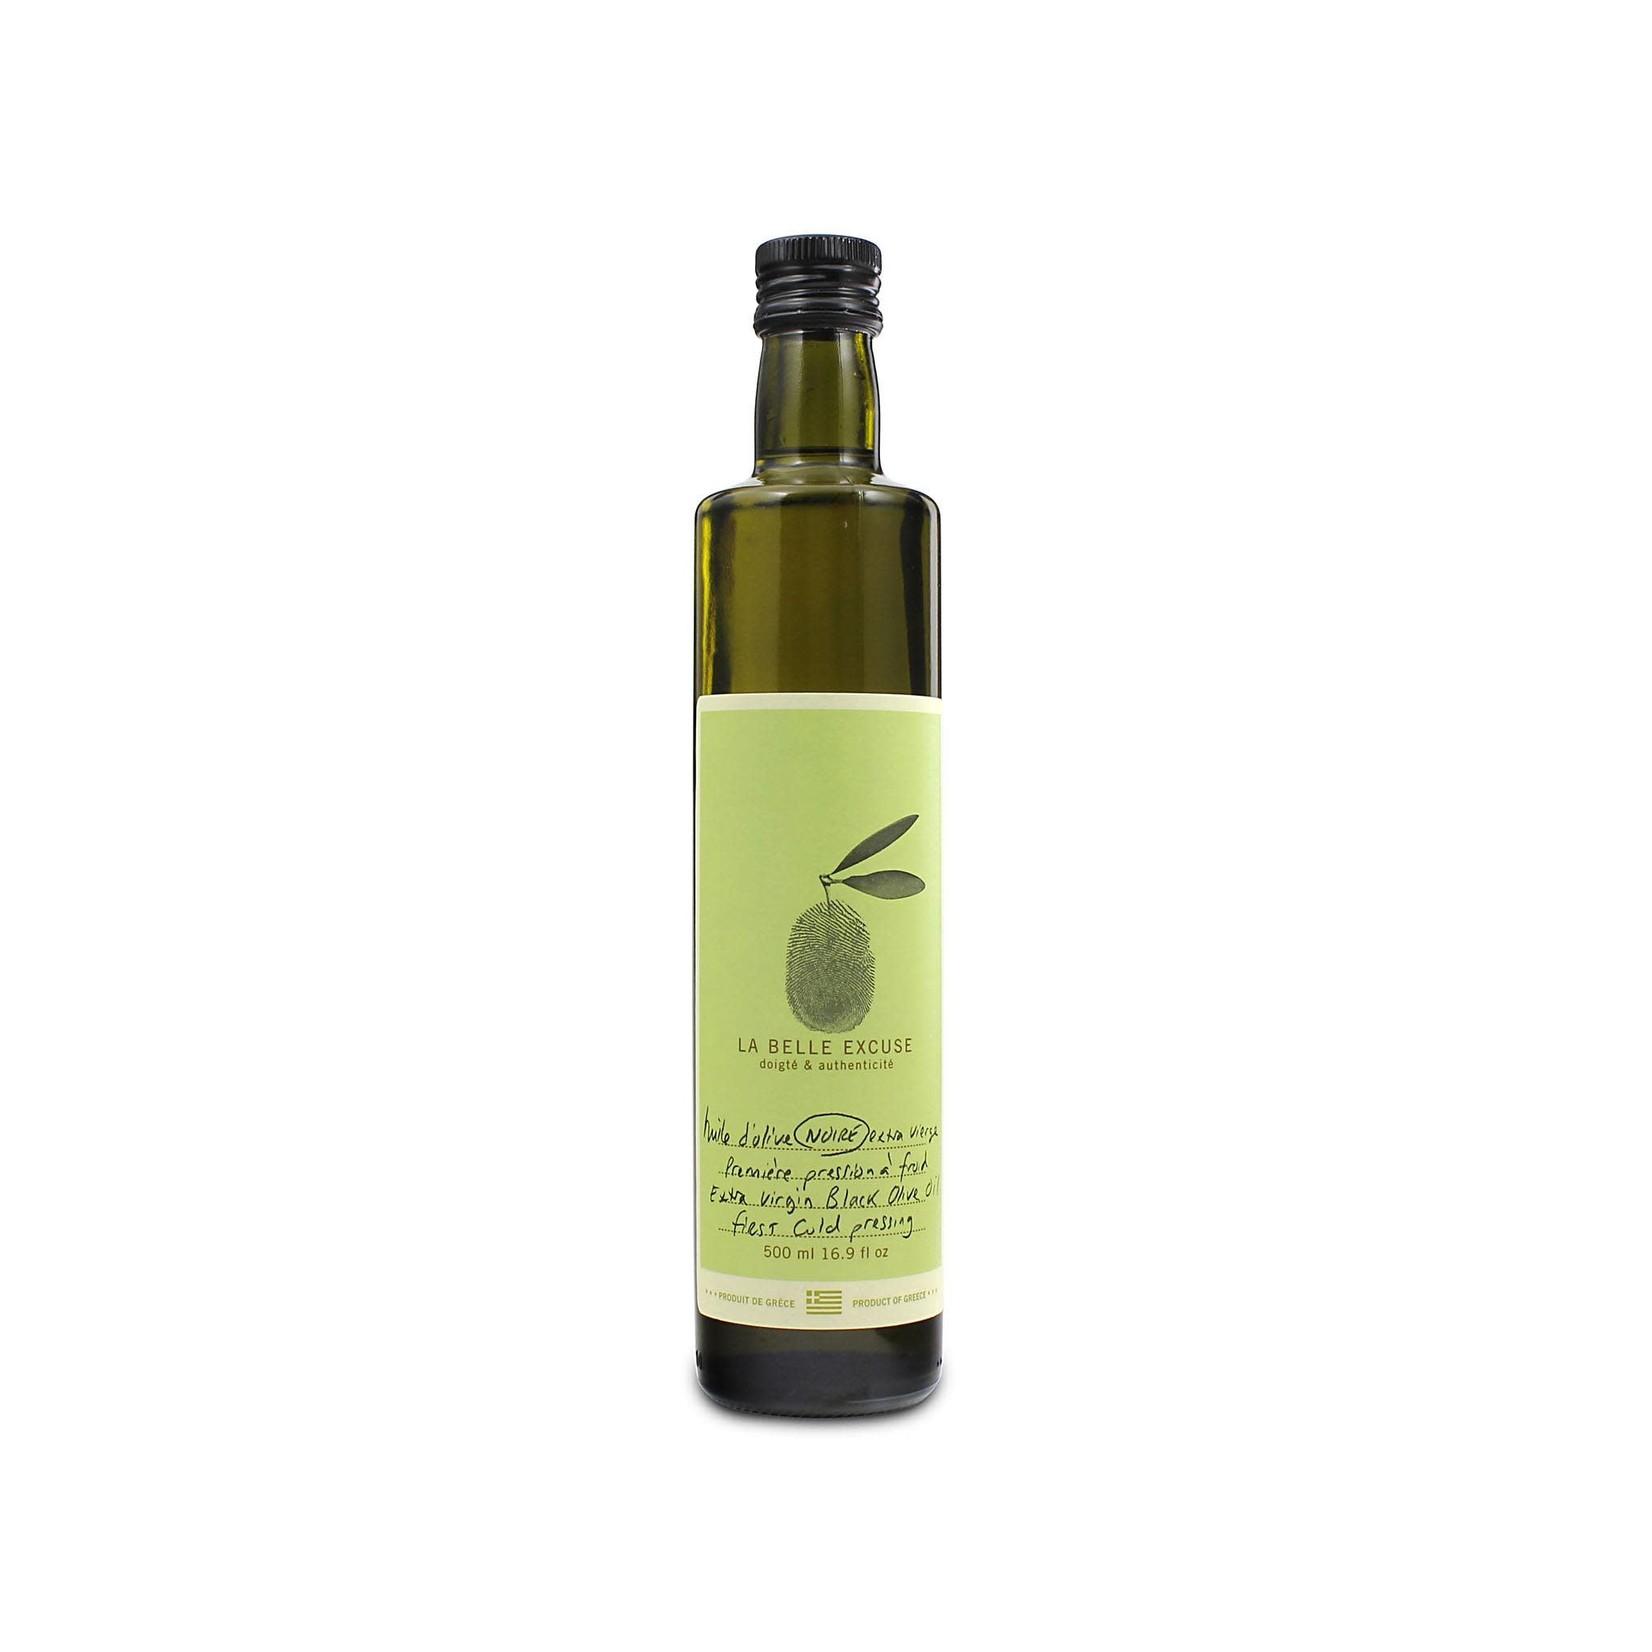 La belle excuse Huile olive extra vierge noire 500ml